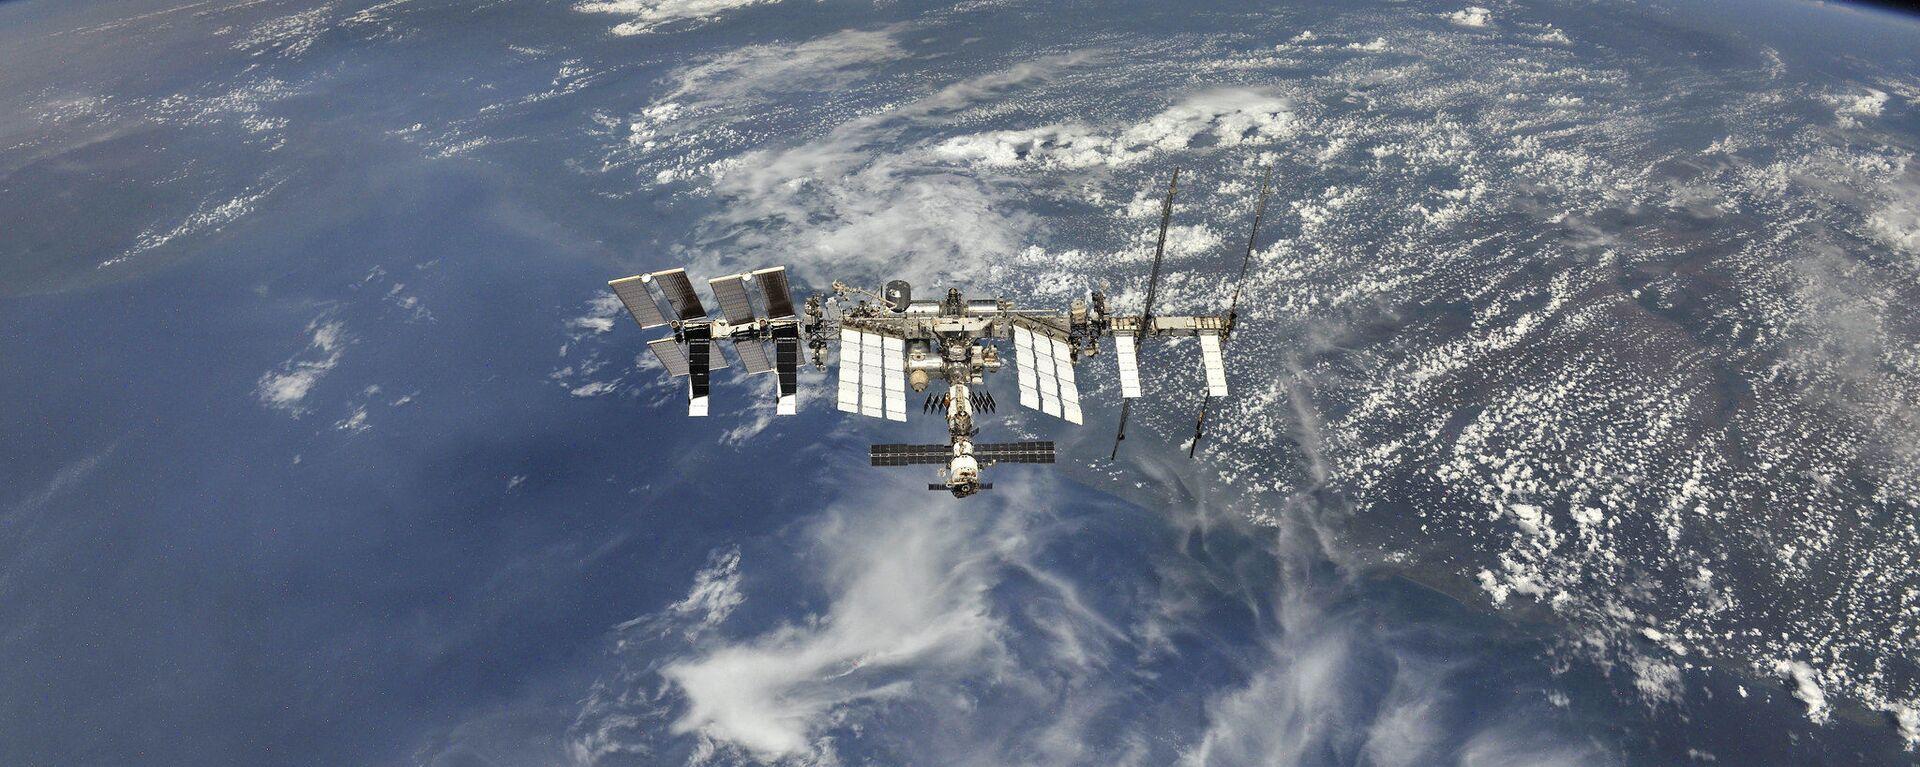 Estación Espacial Internacional (EEI) - Sputnik Mundo, 1920, 23.04.2021